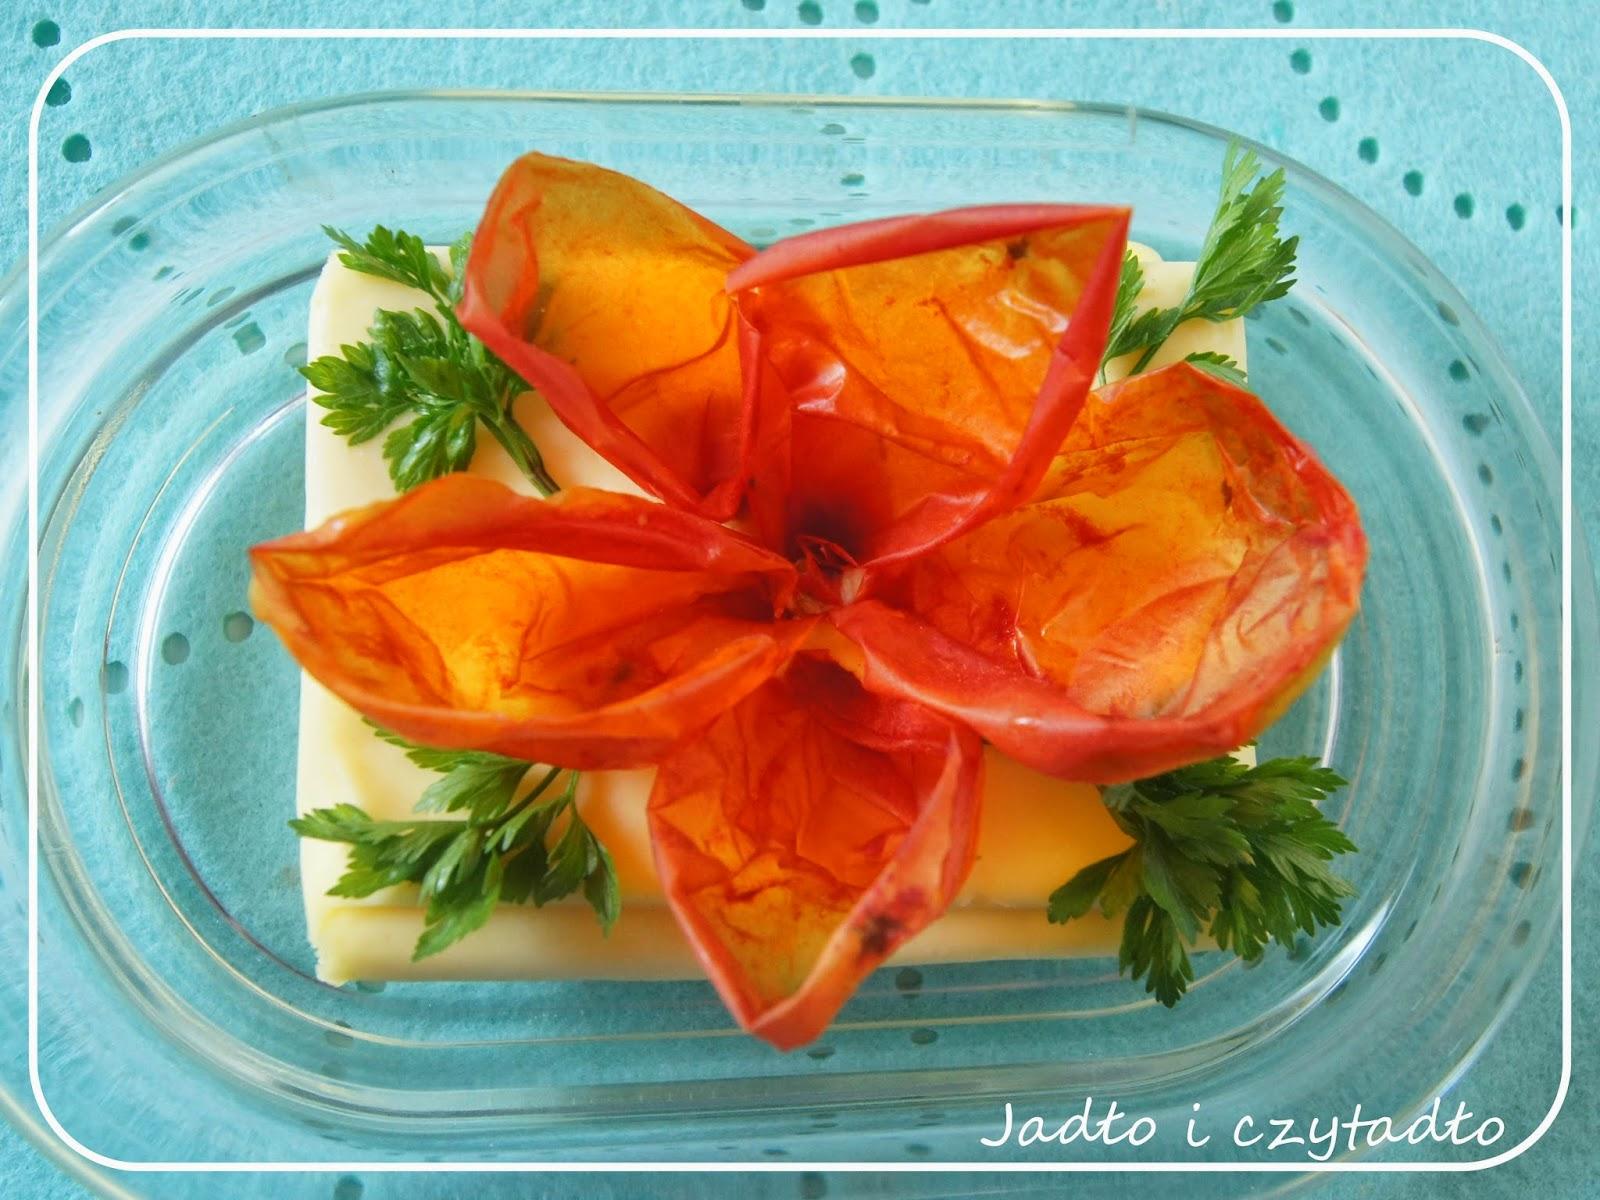 http://jadloiczytadlo.blogspot.com/2014/09/kwiat-z-suszonej-skorki-pomidora.html